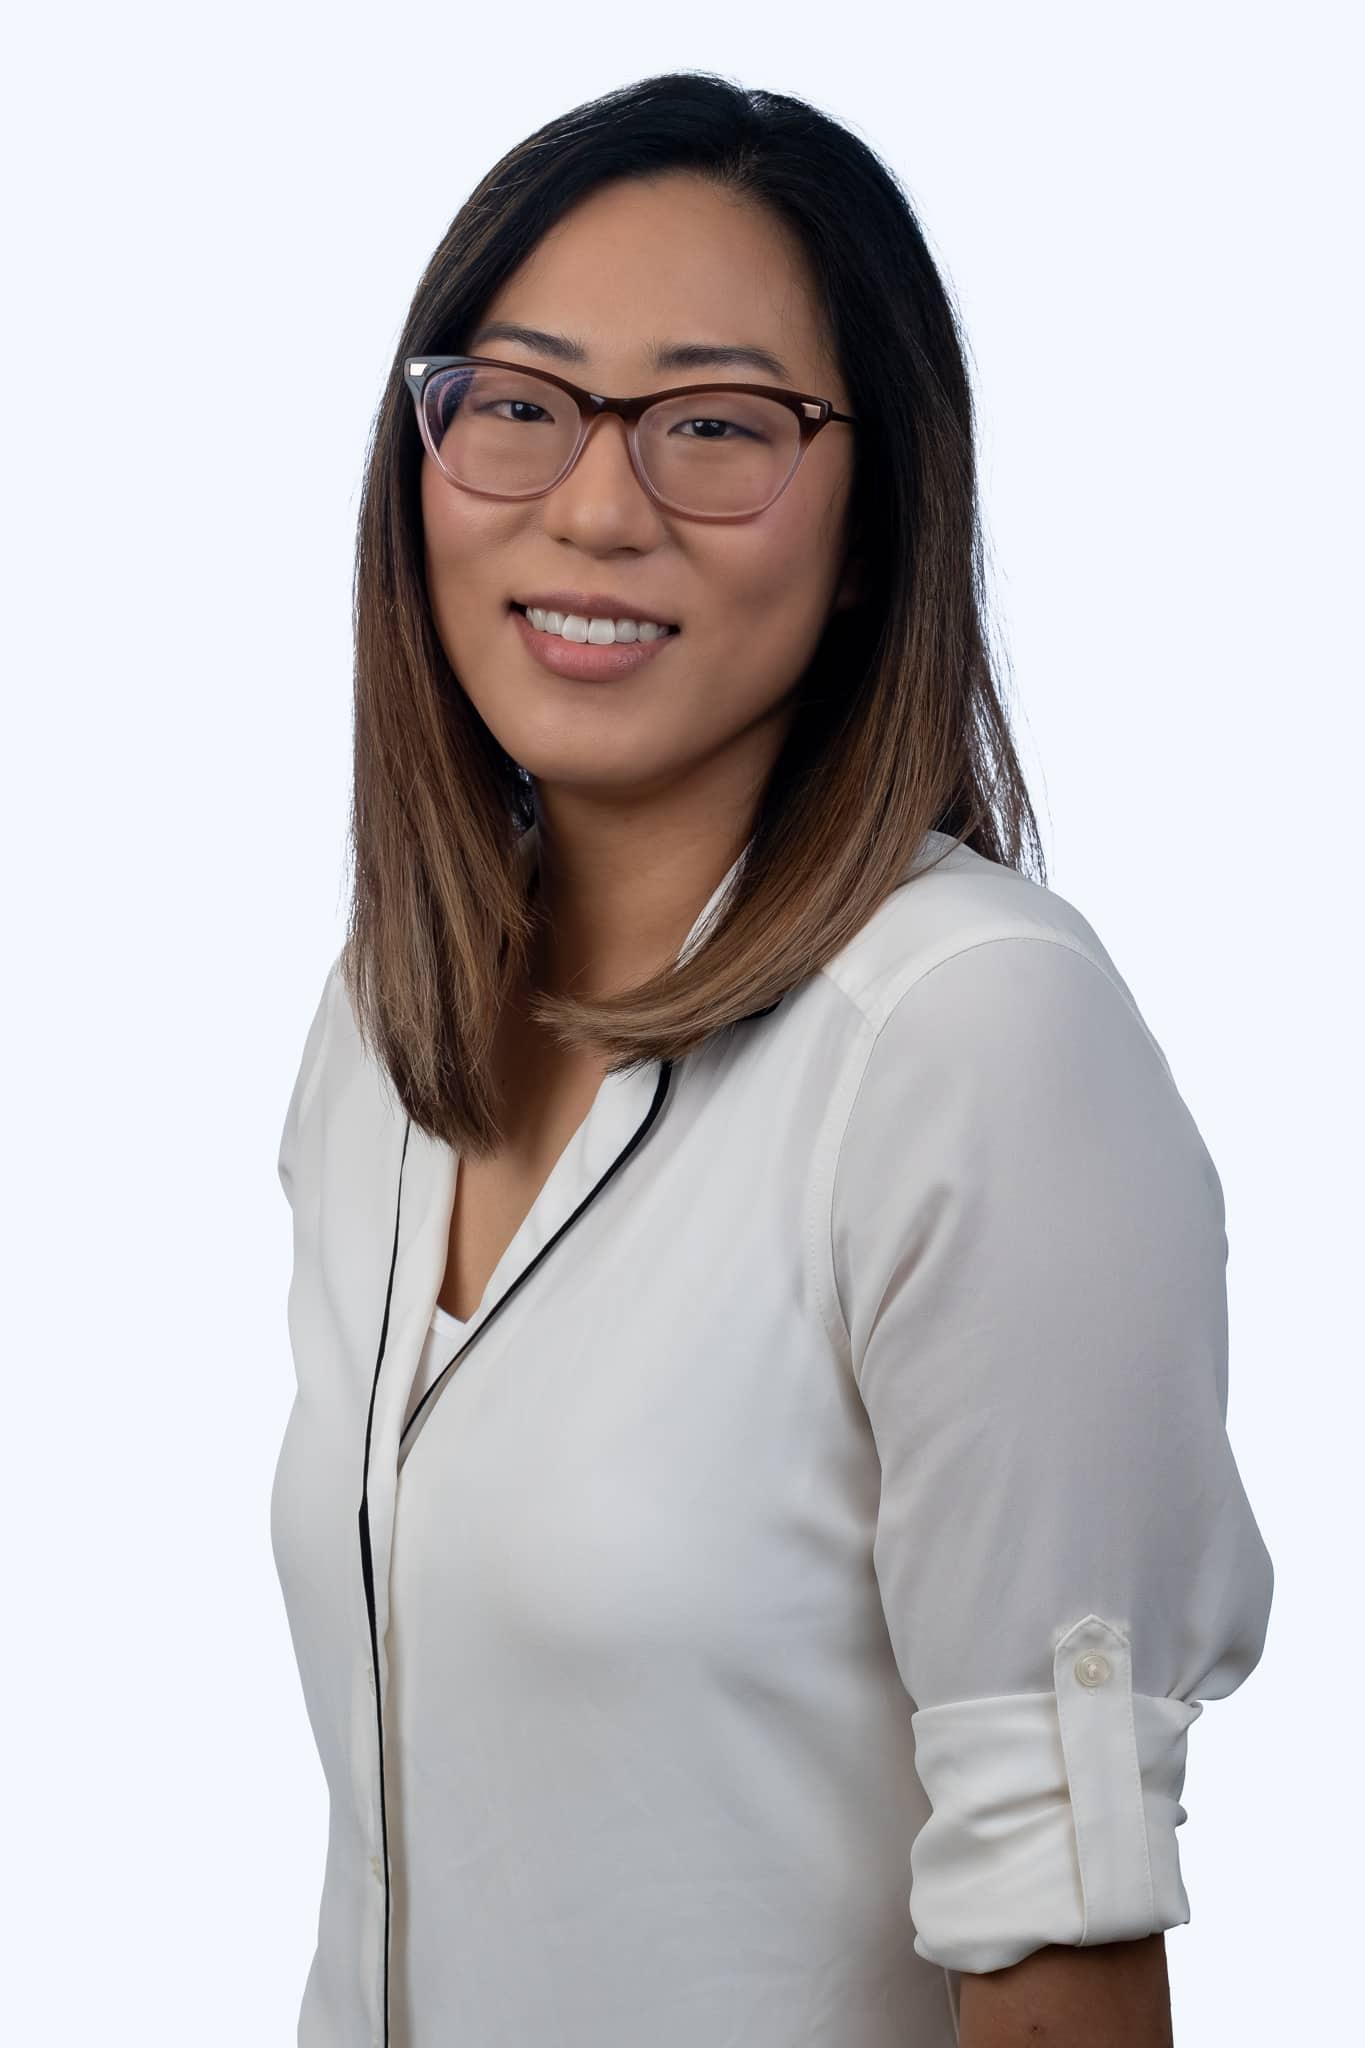 Dr. Sherry Choi